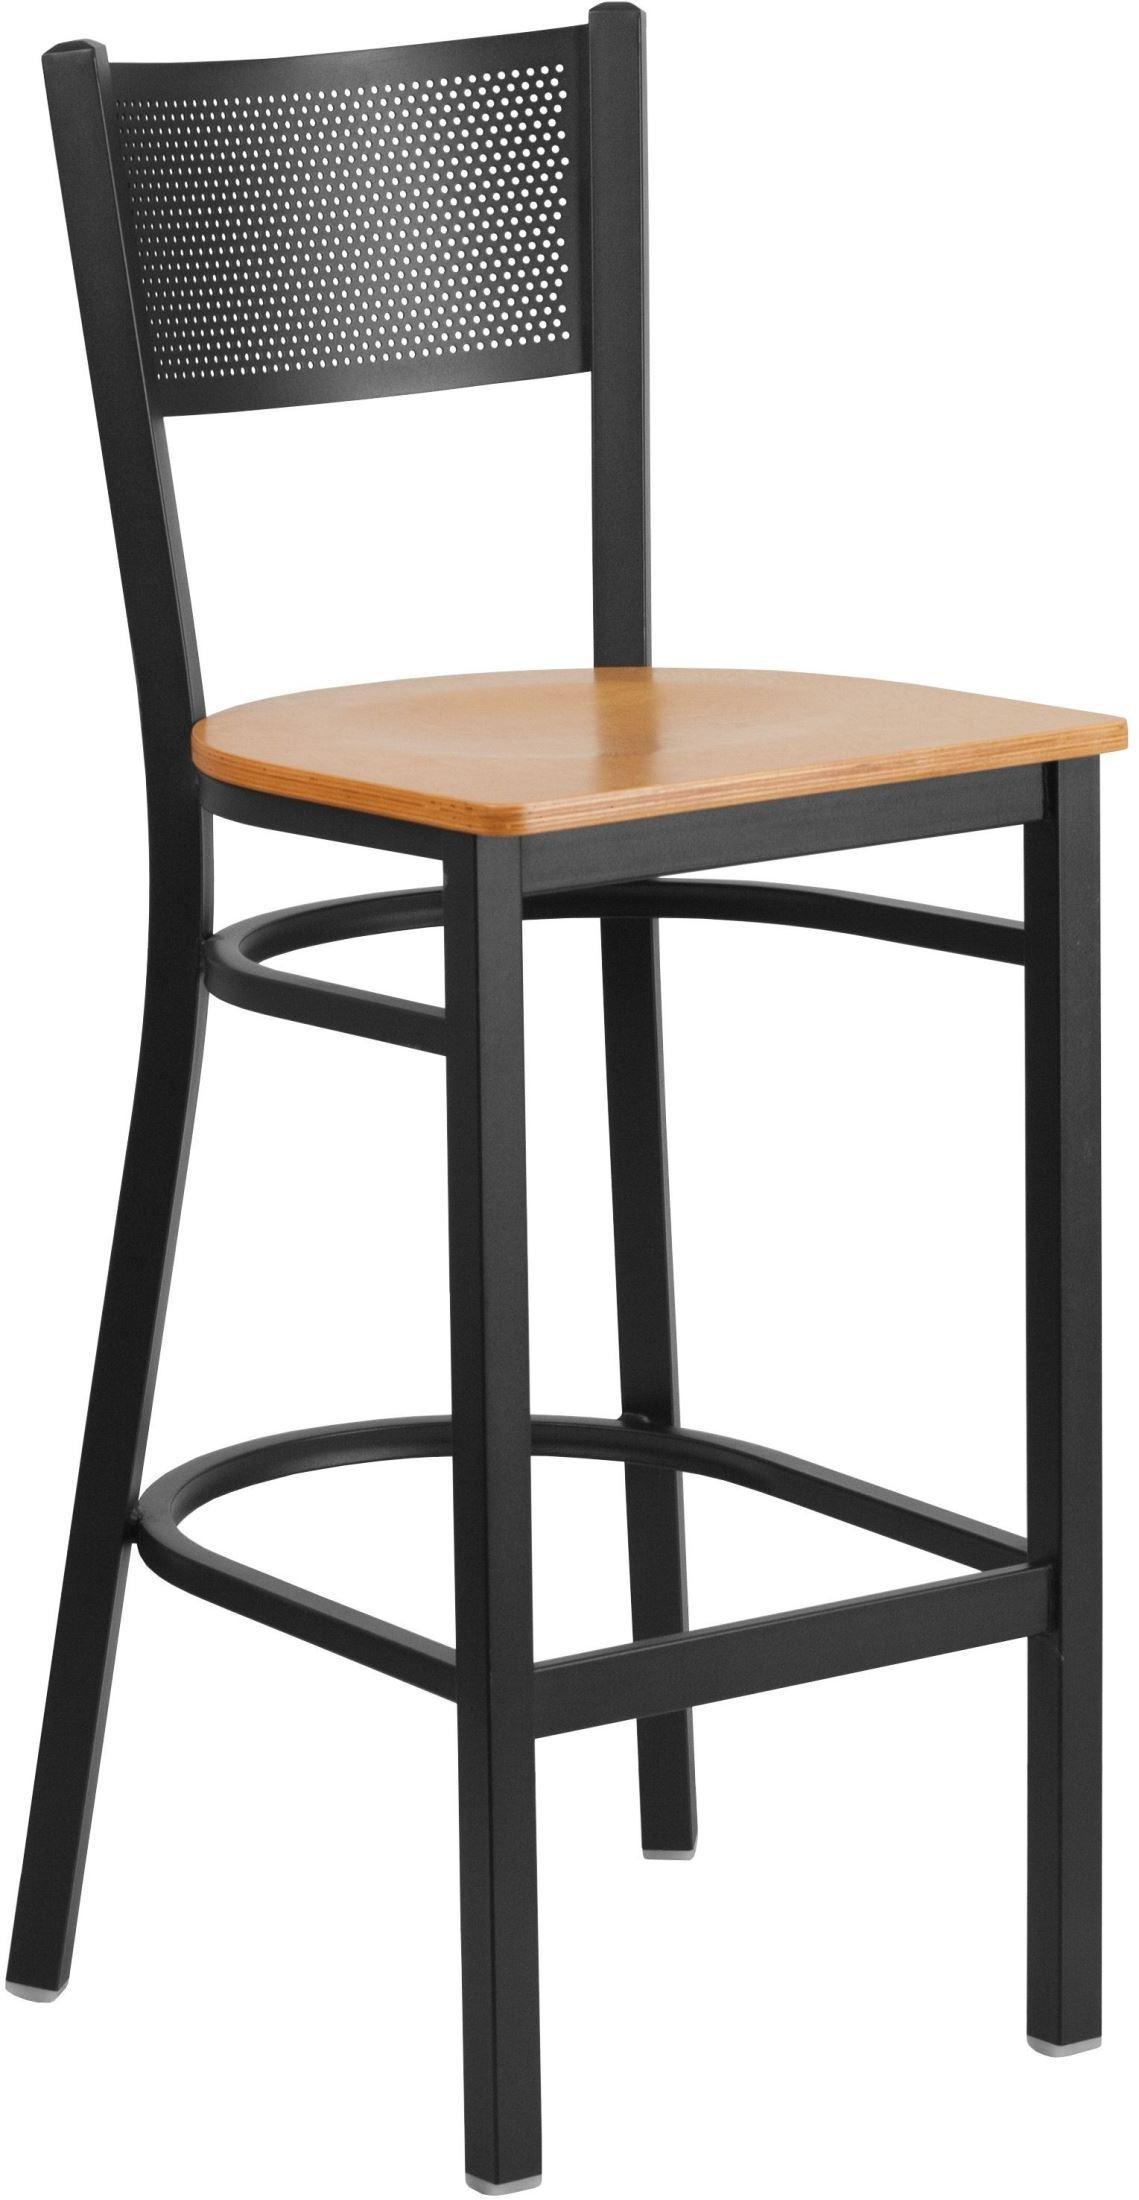 HERCULES Series Black Grid Back Natural Wood Seat  : xu dg 60116 grd bar natw gg from colemanfurniture.com size 1139 x 2200 jpeg 219kB